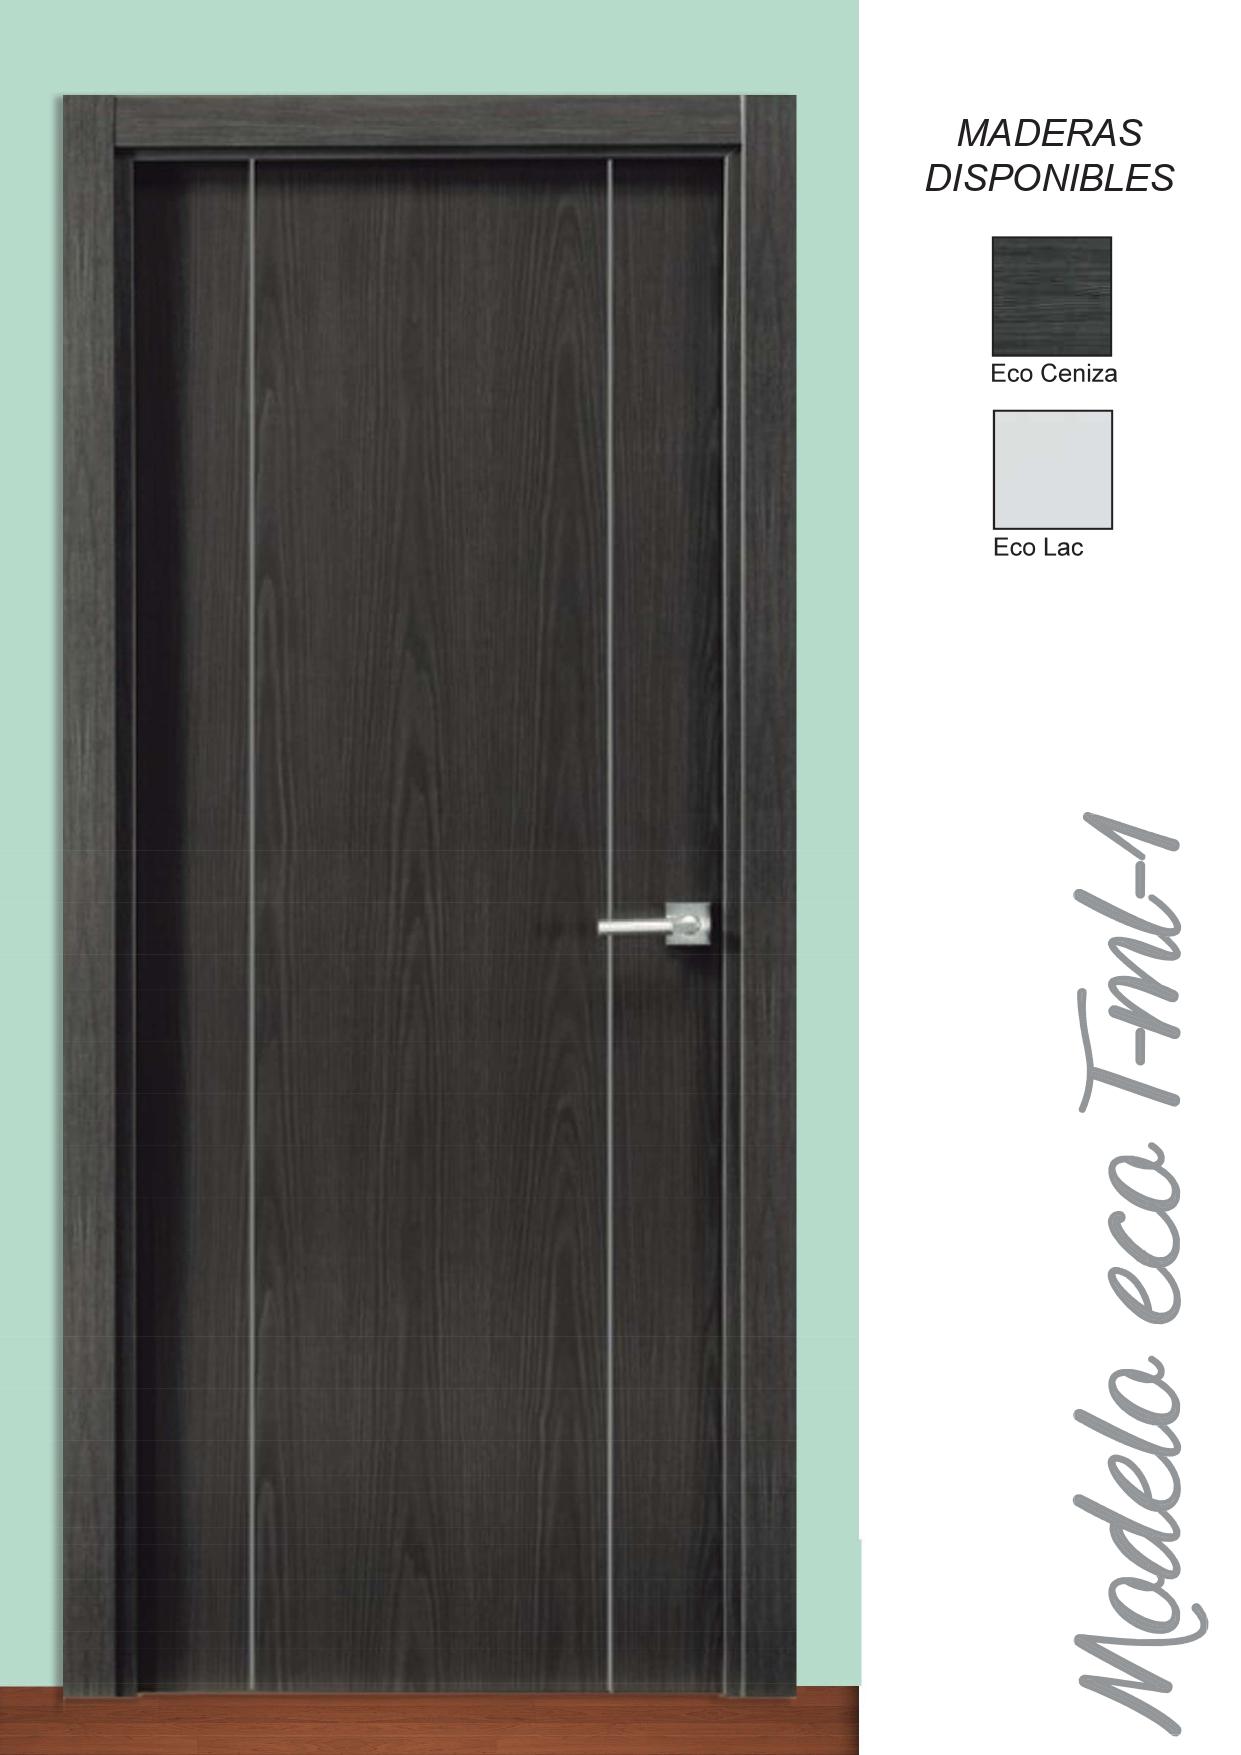 Puerta Modelo Eco t-ml-1